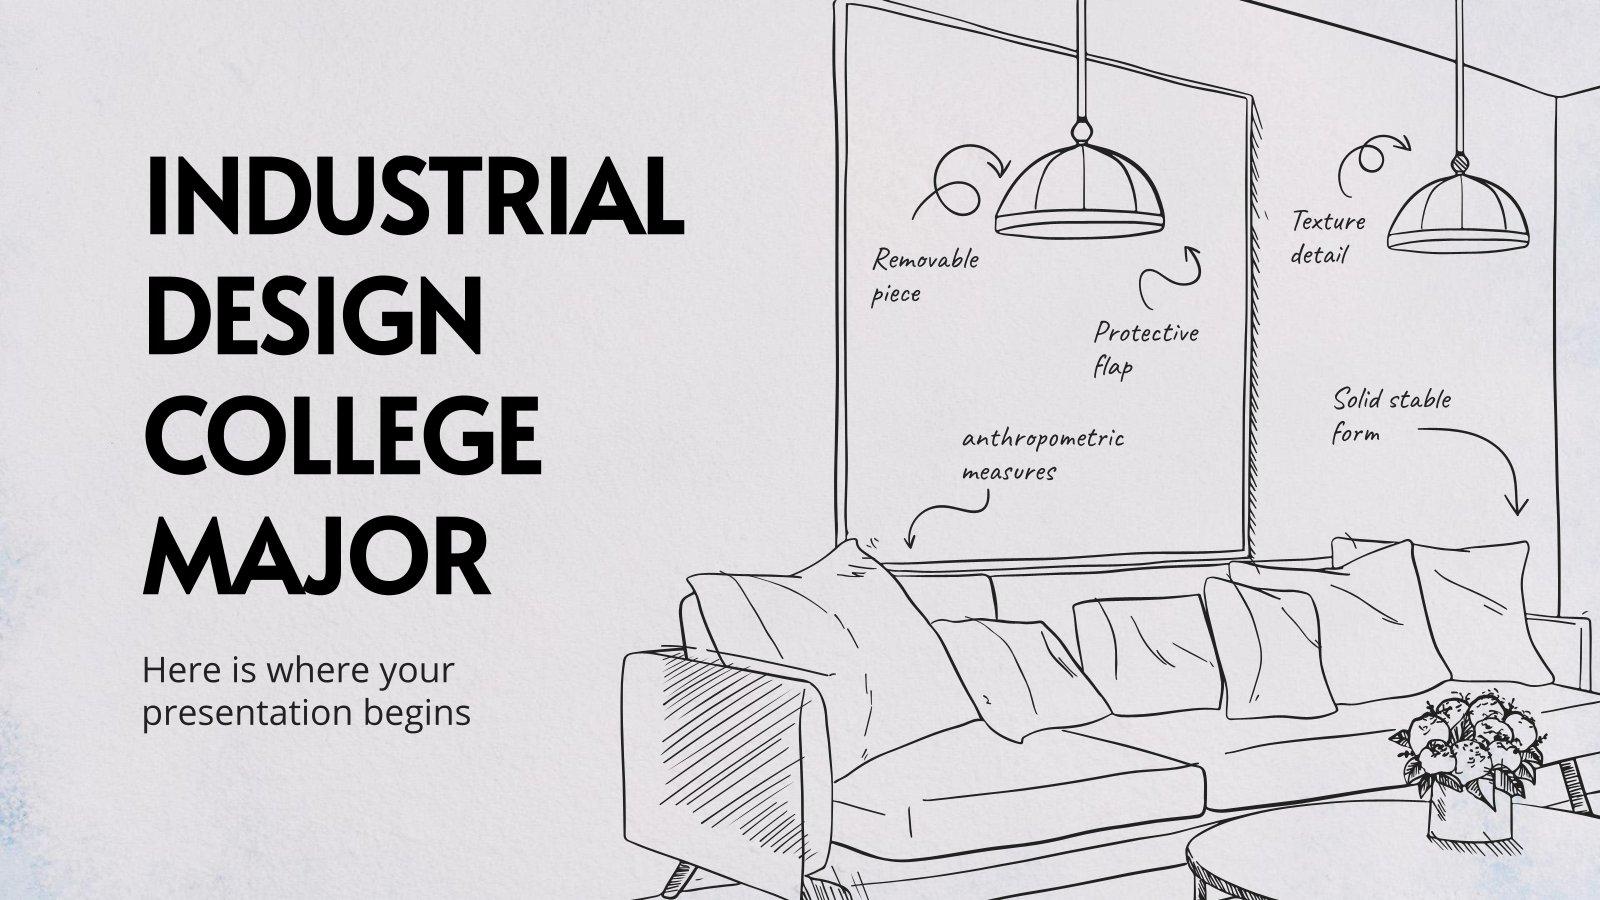 Industrial Design College Major presentation template